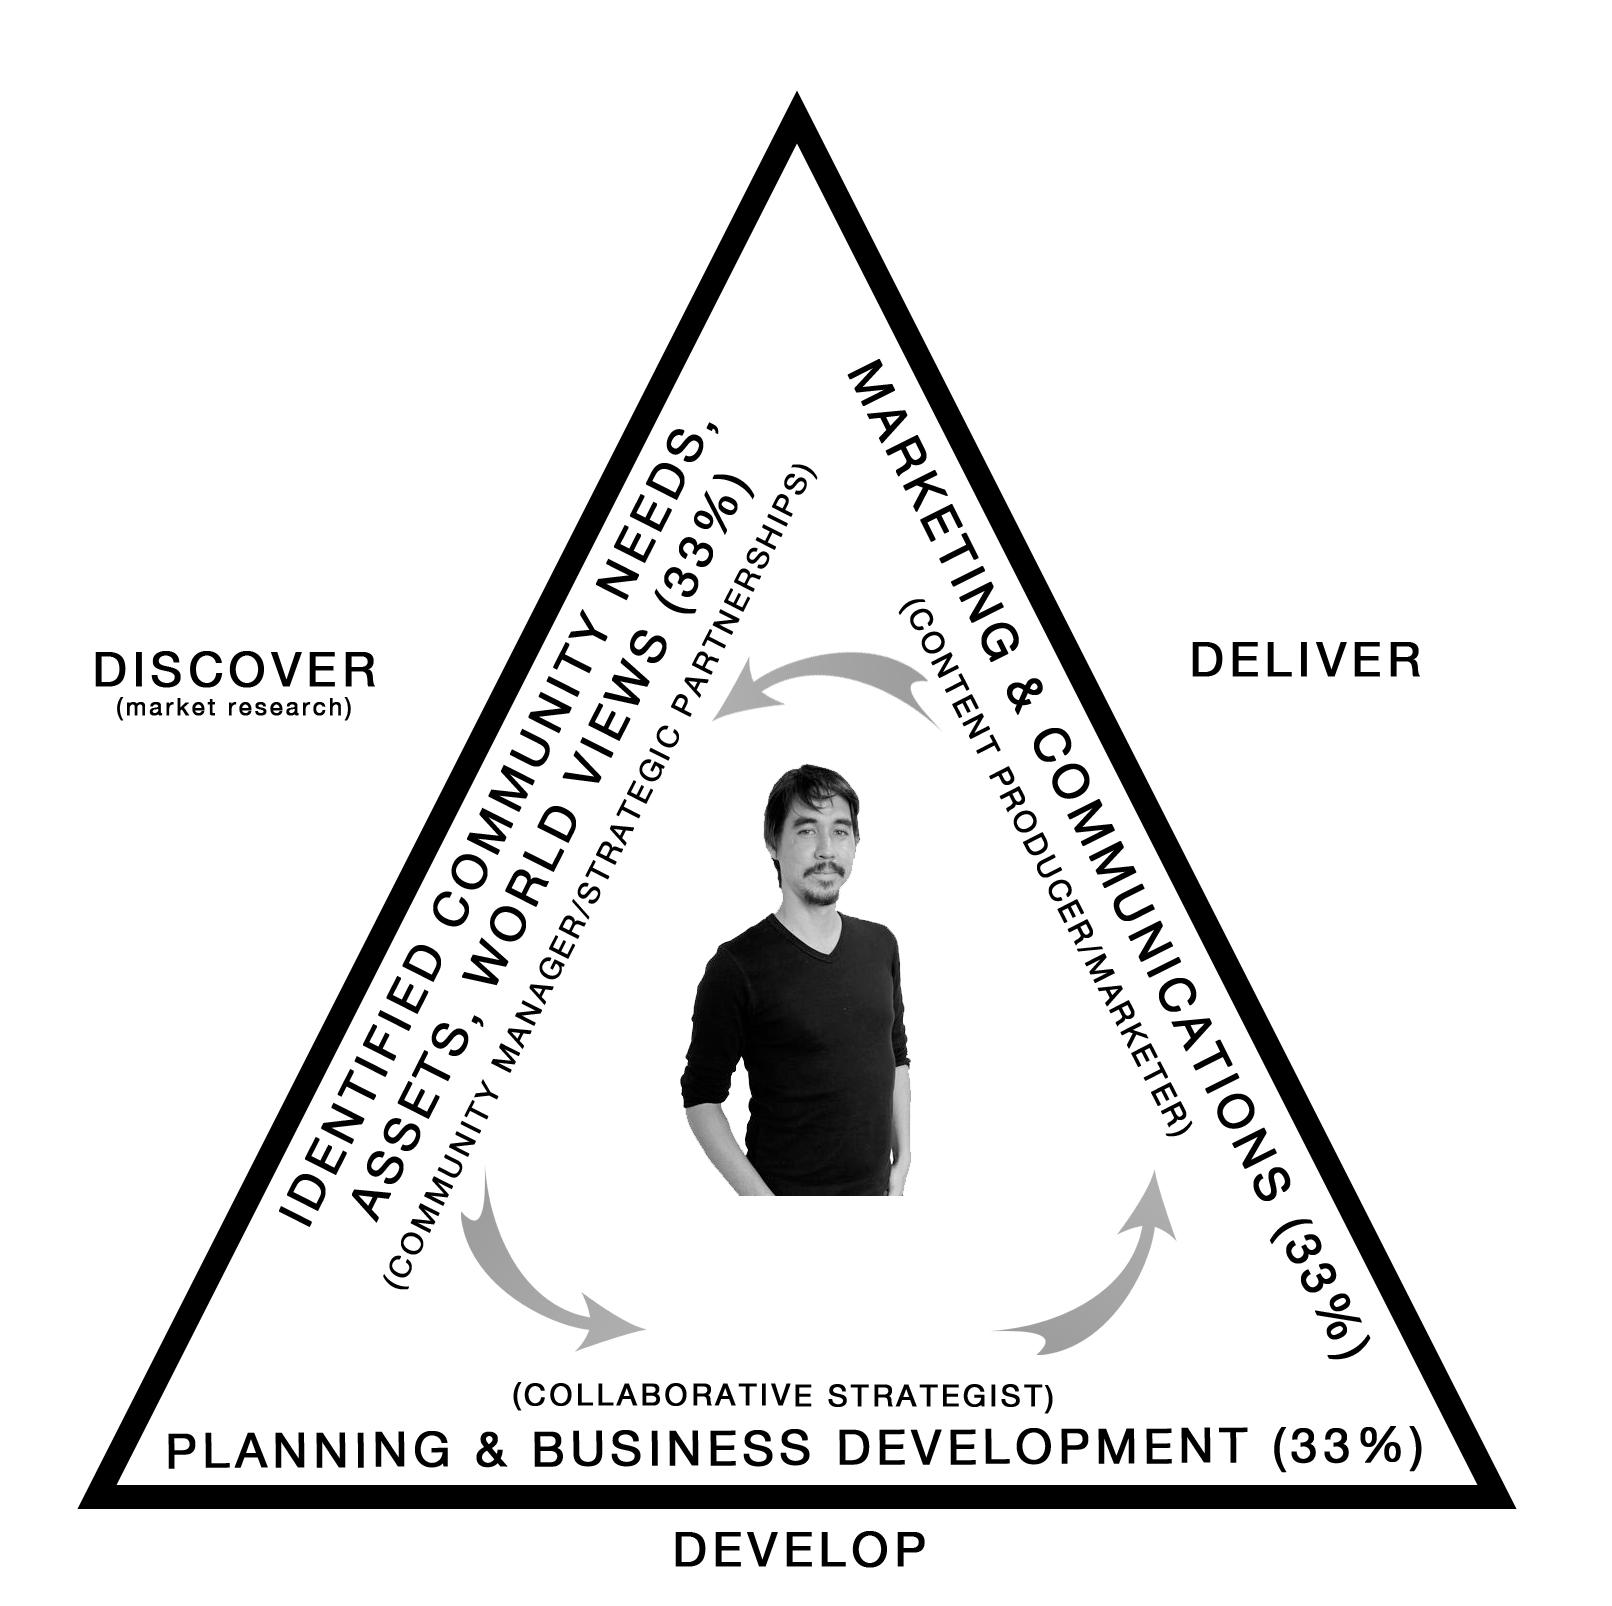 Discover Develop Deliver